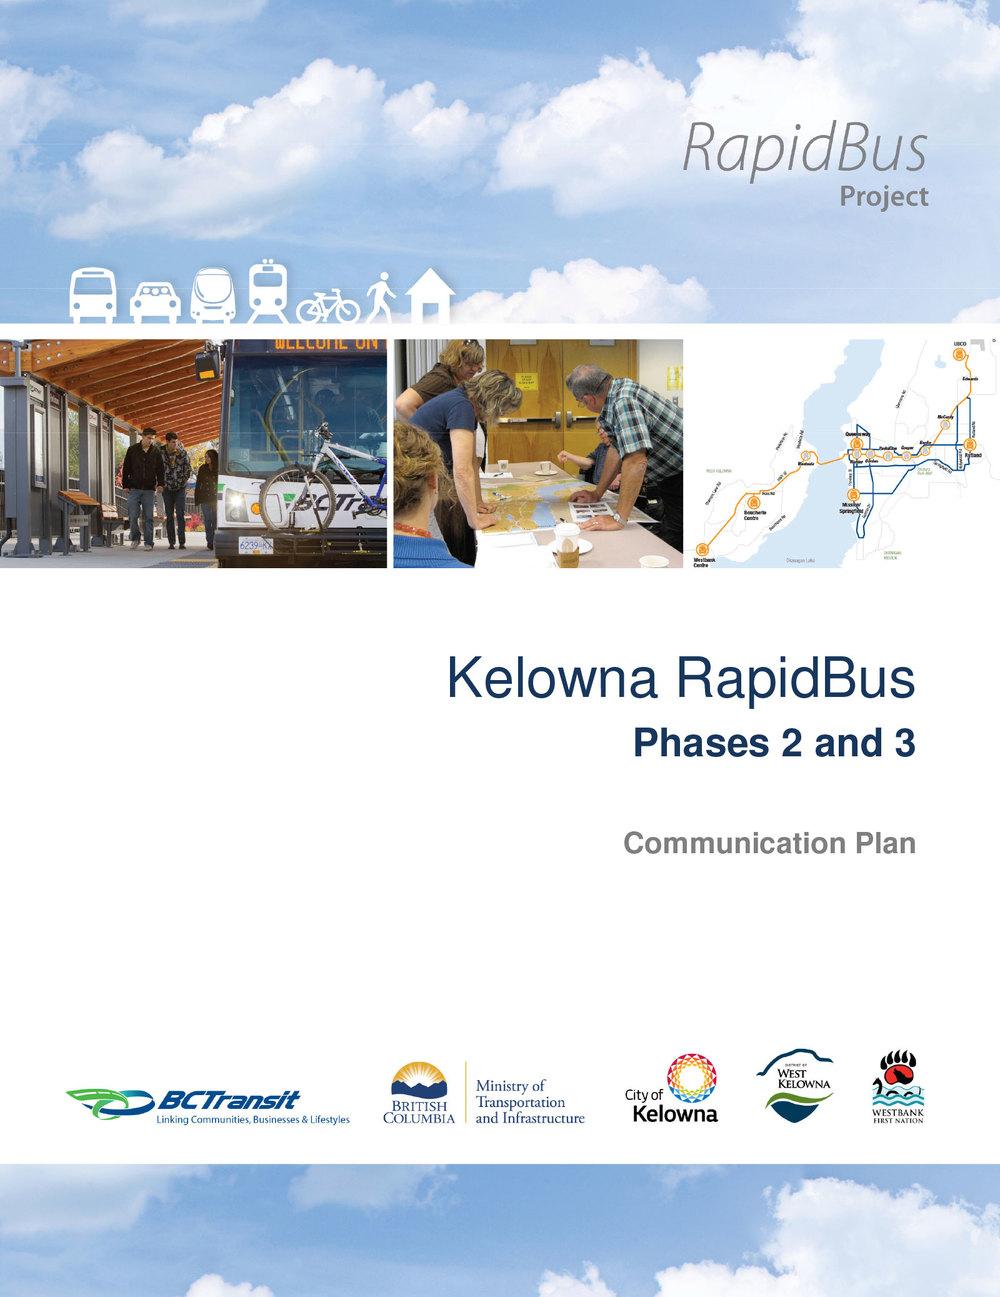 BC Transit: Kelowna RapidBus Communications Plan